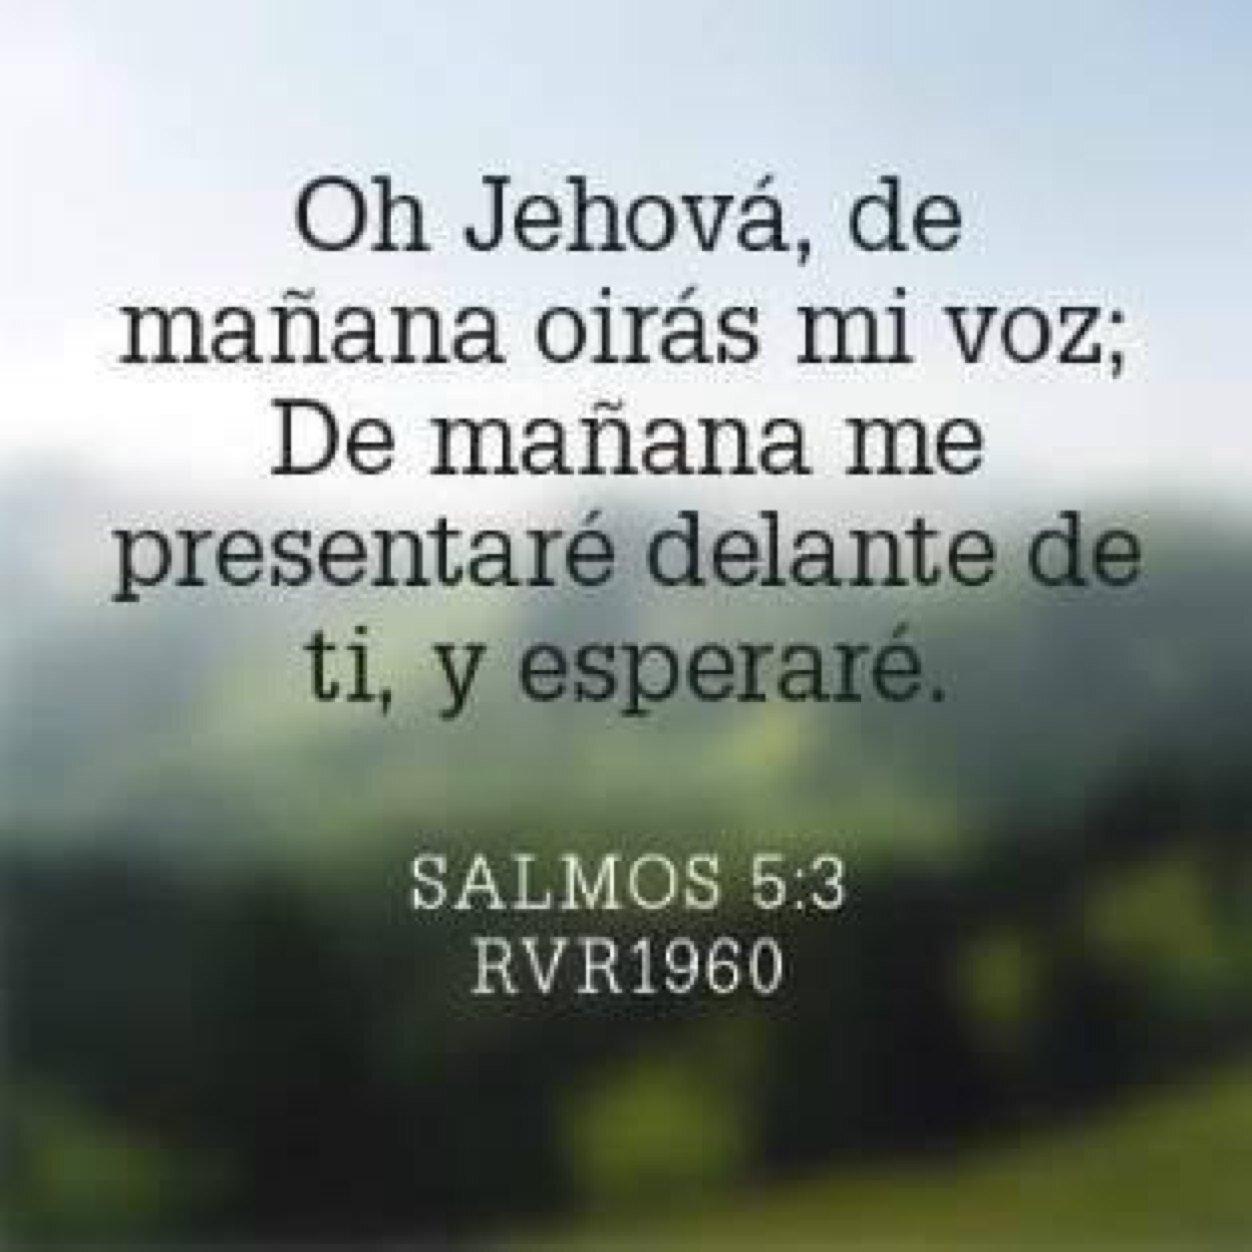 Salmo Matrimonio Biblia : Expandiendo el reino dios twitter